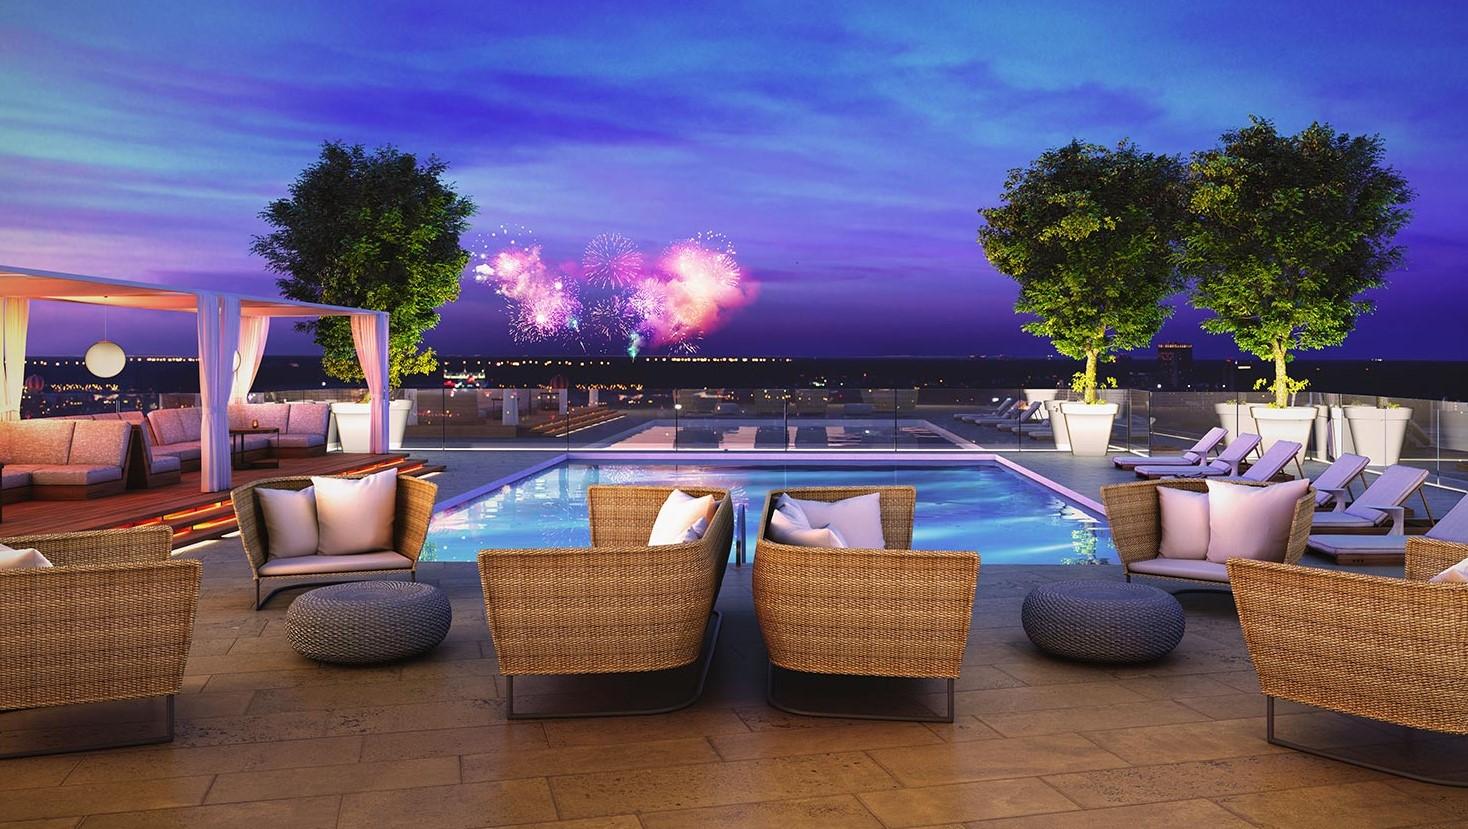 https://ahe-ro.s3.amazonaws.com/5295/ph-premiere-rooftop-pool-deckb.jpg